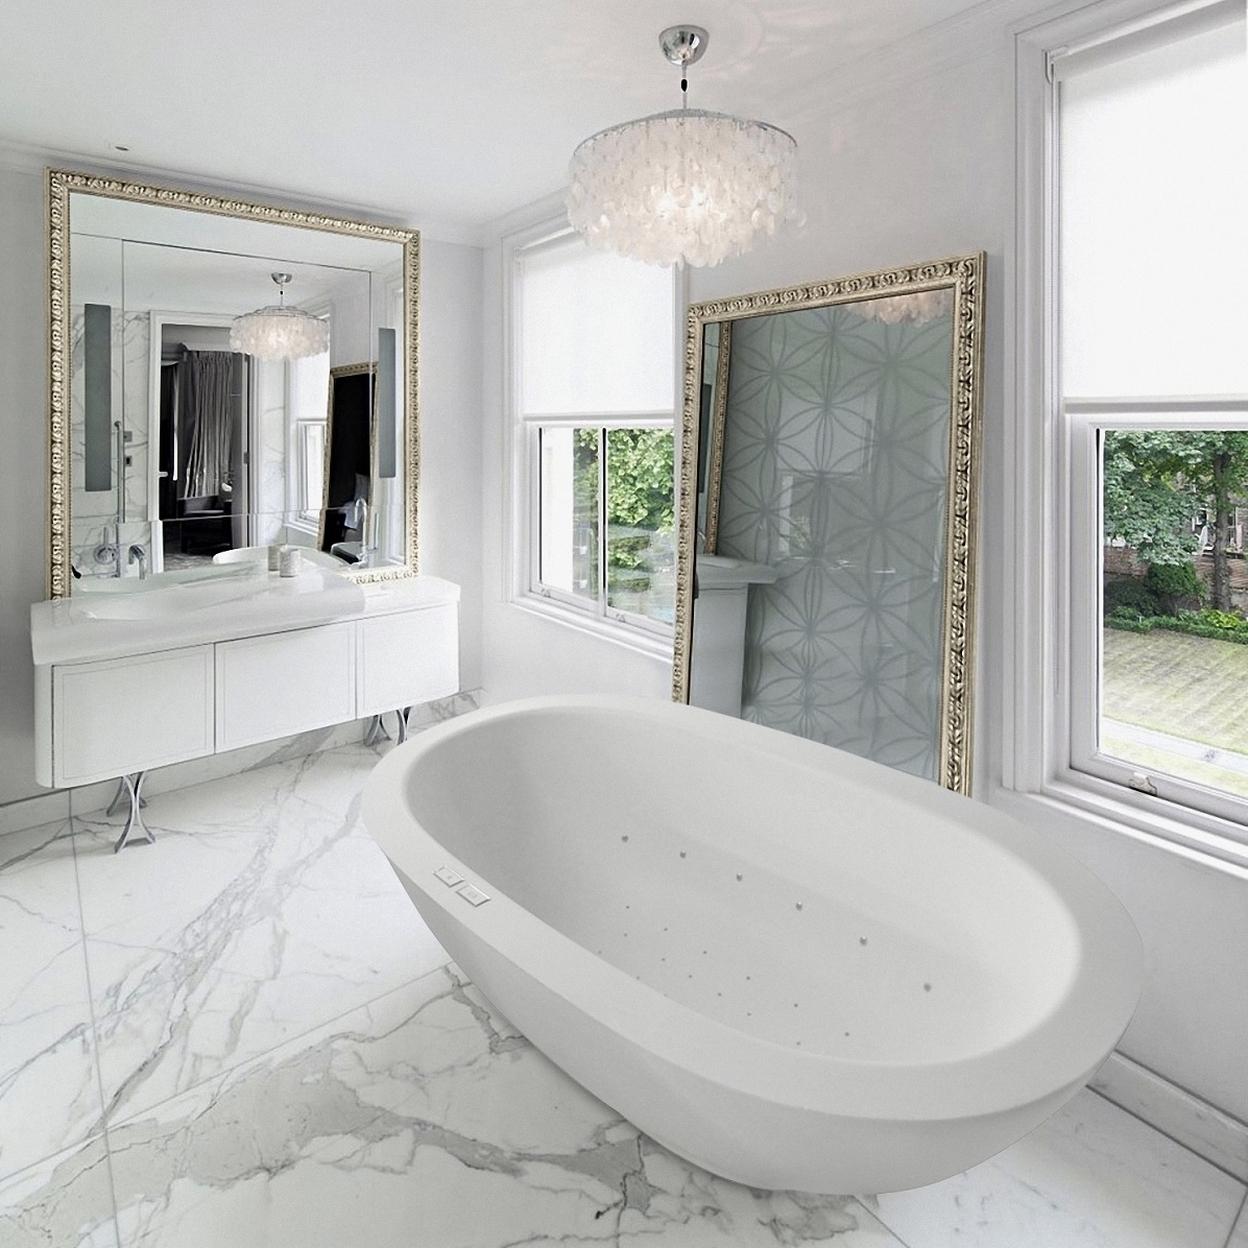 Karolina Relax Stone Air Massage Bathtub - Fine Matte 56f30cbe923d6ff05a8b4a27